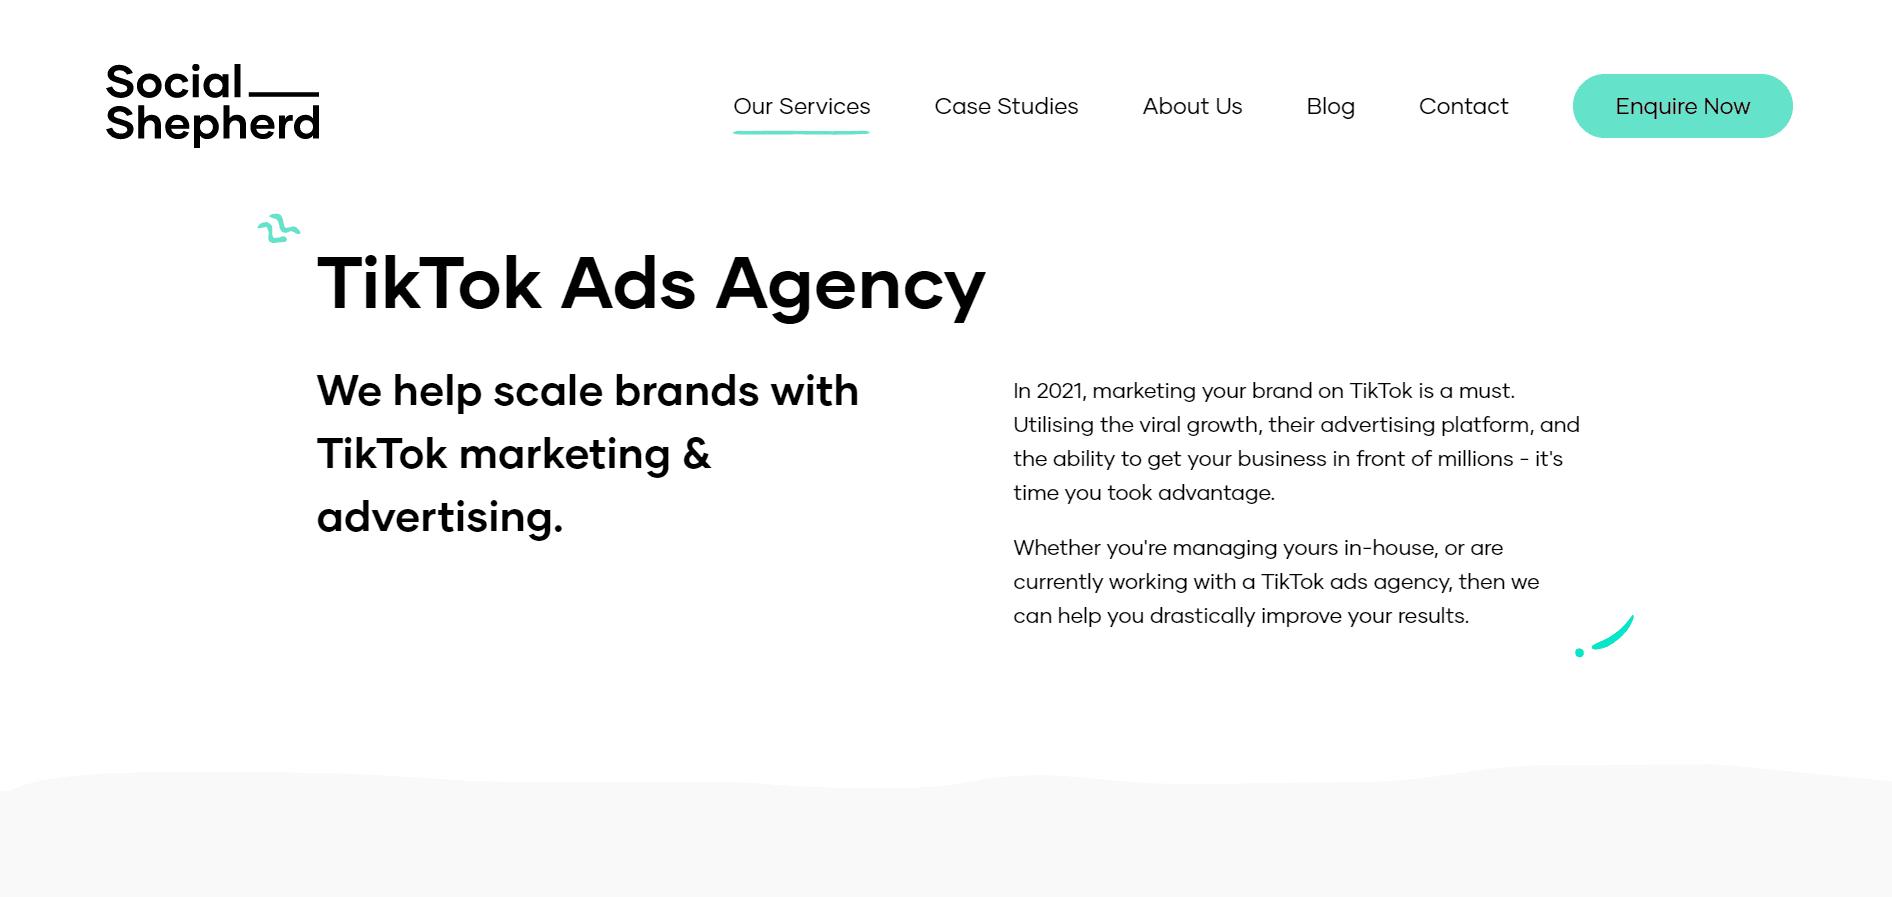 Top Results-Driven TikTok Marketing Agency